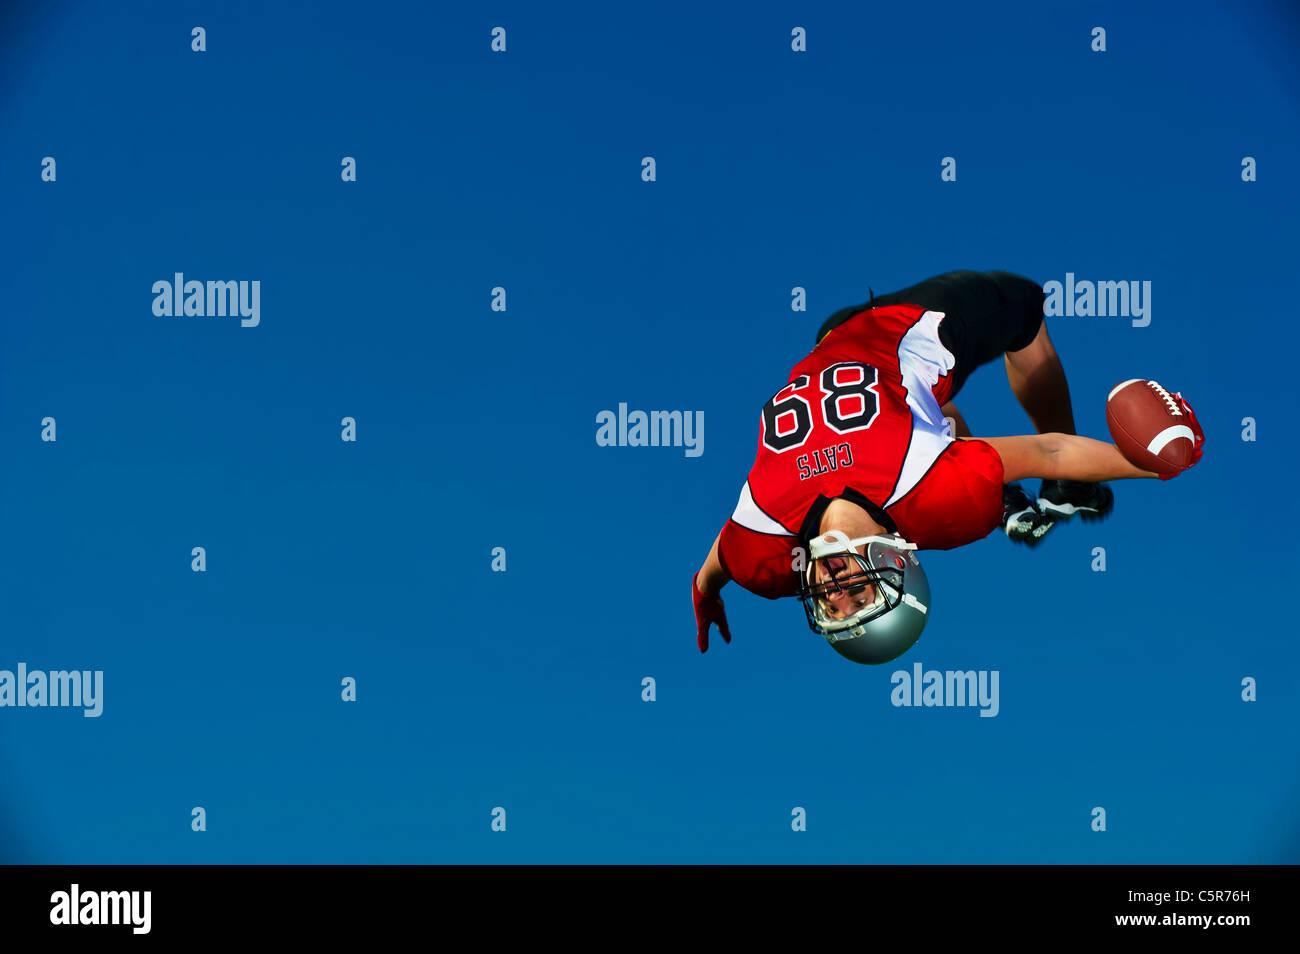 Jugador de fútbol americano celebra touchdown Imagen De Stock